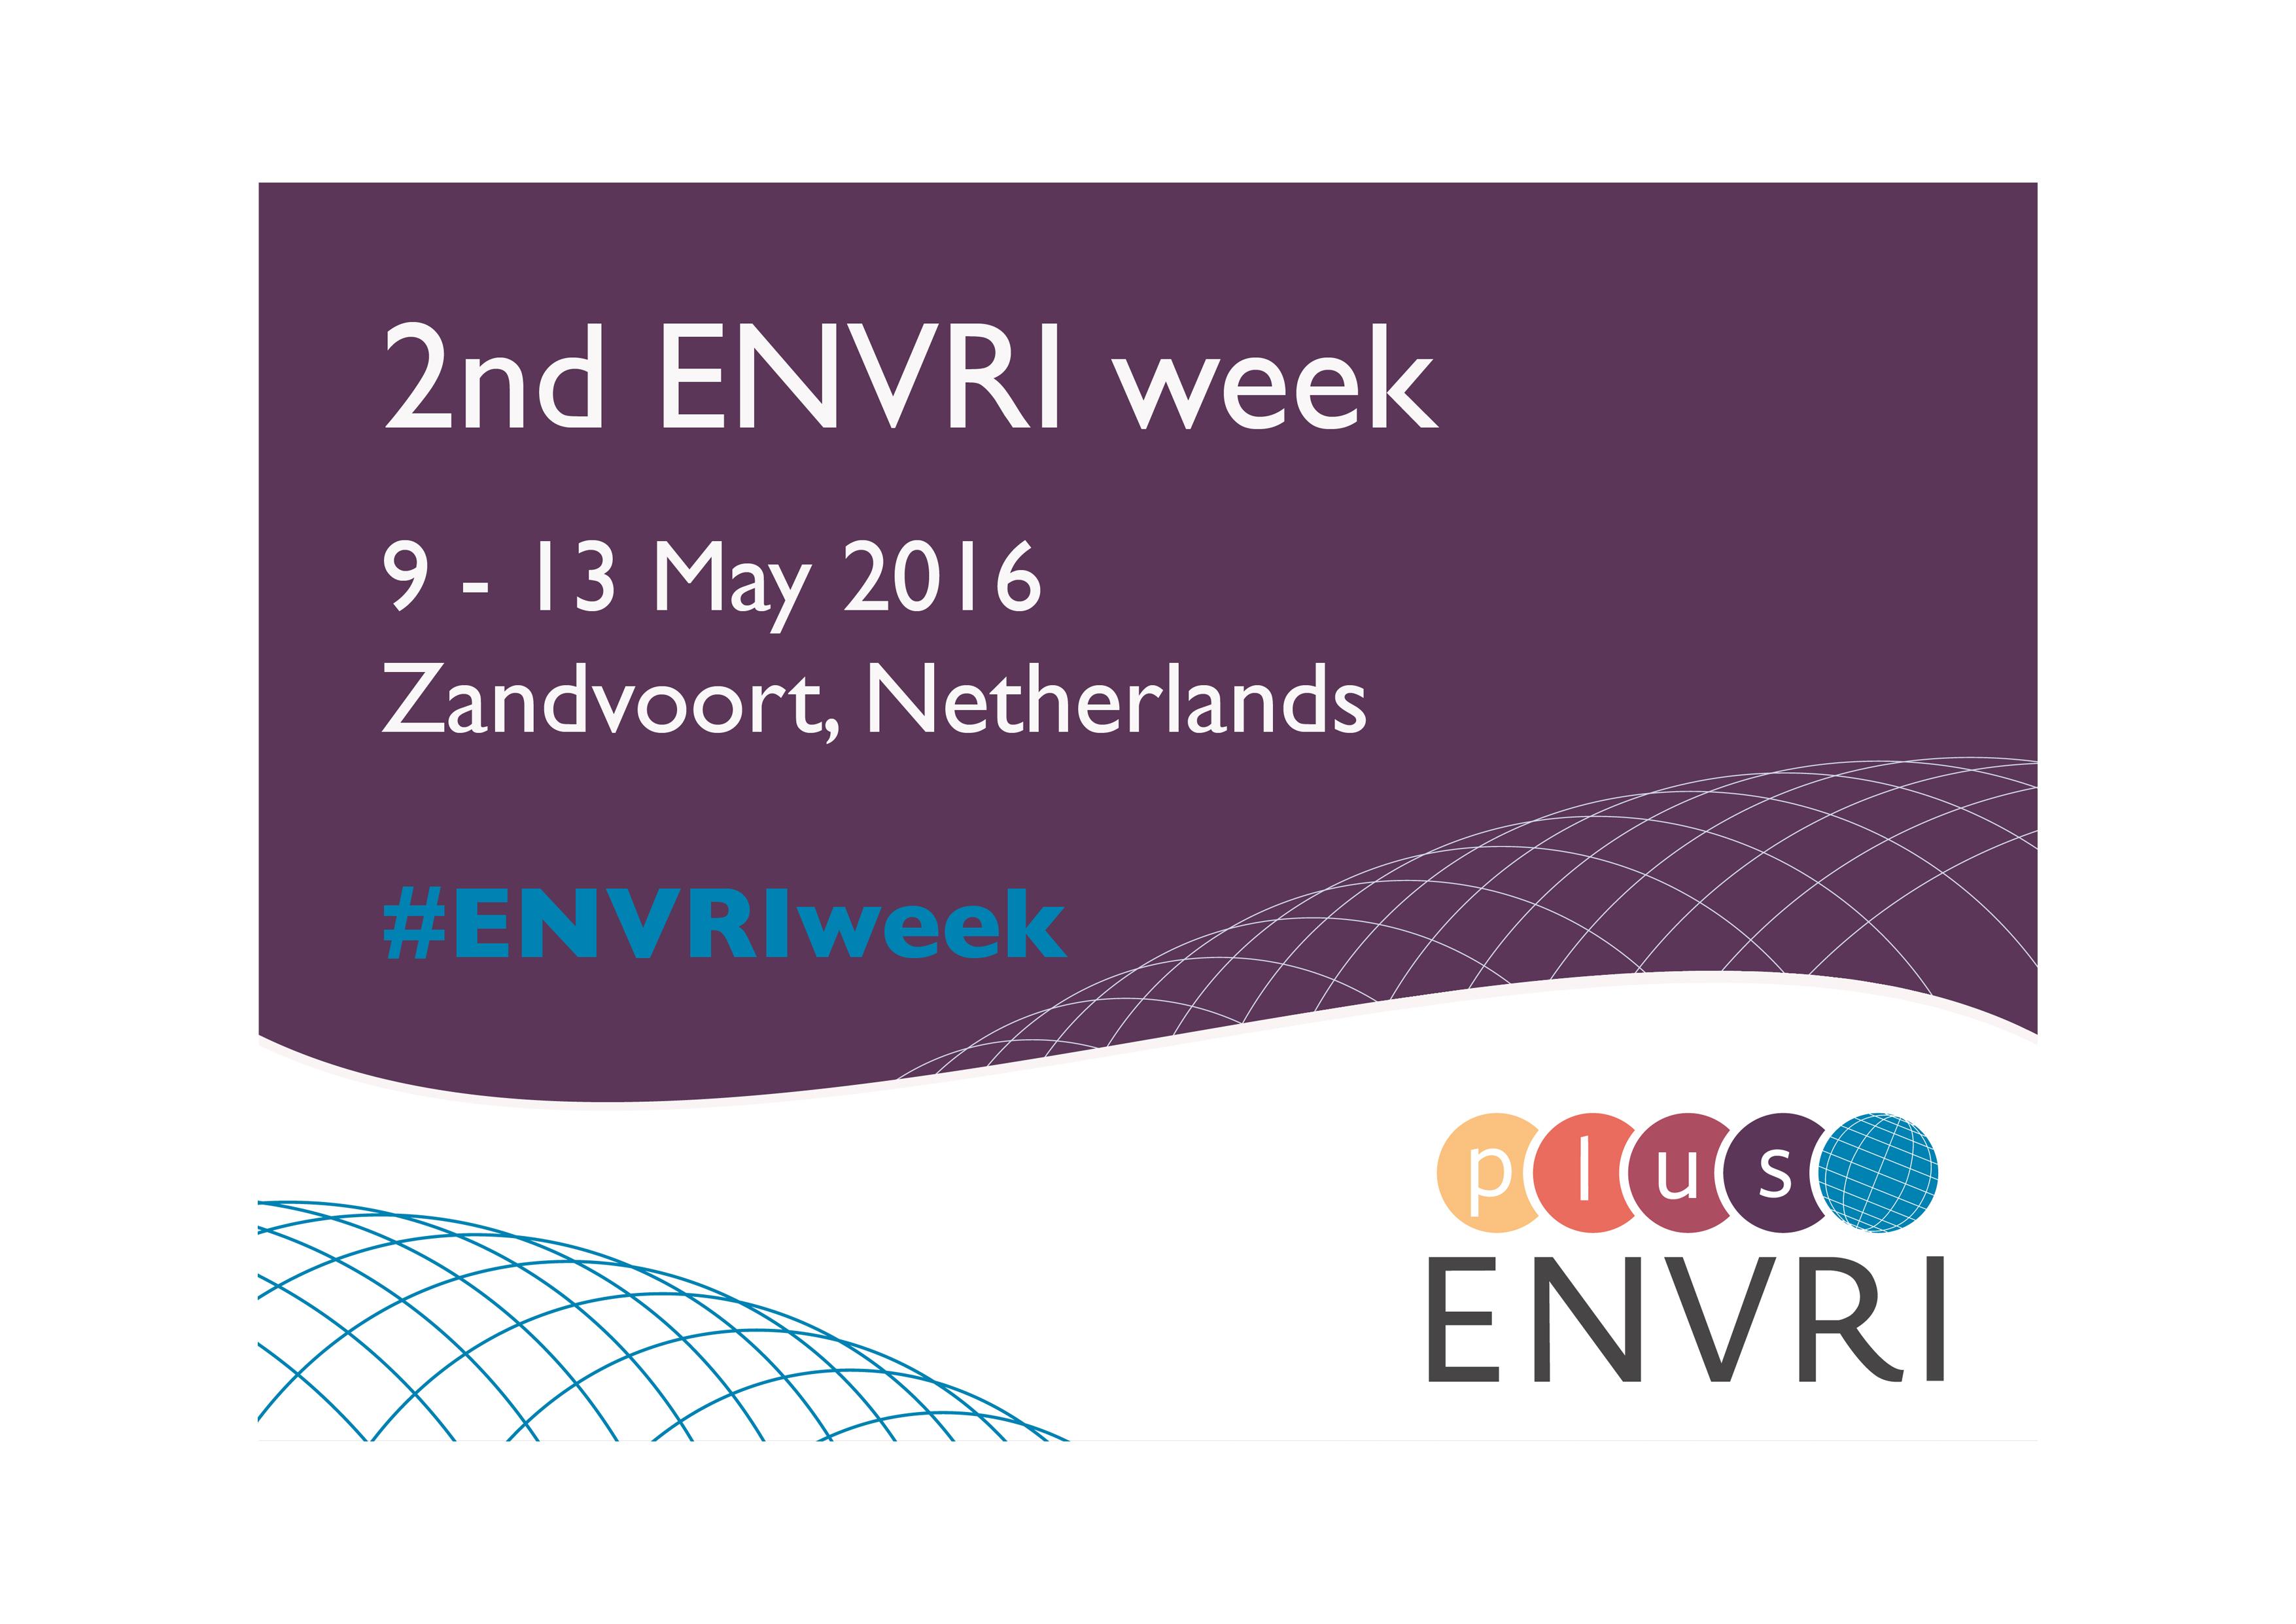 ENVRI week invitation#2_